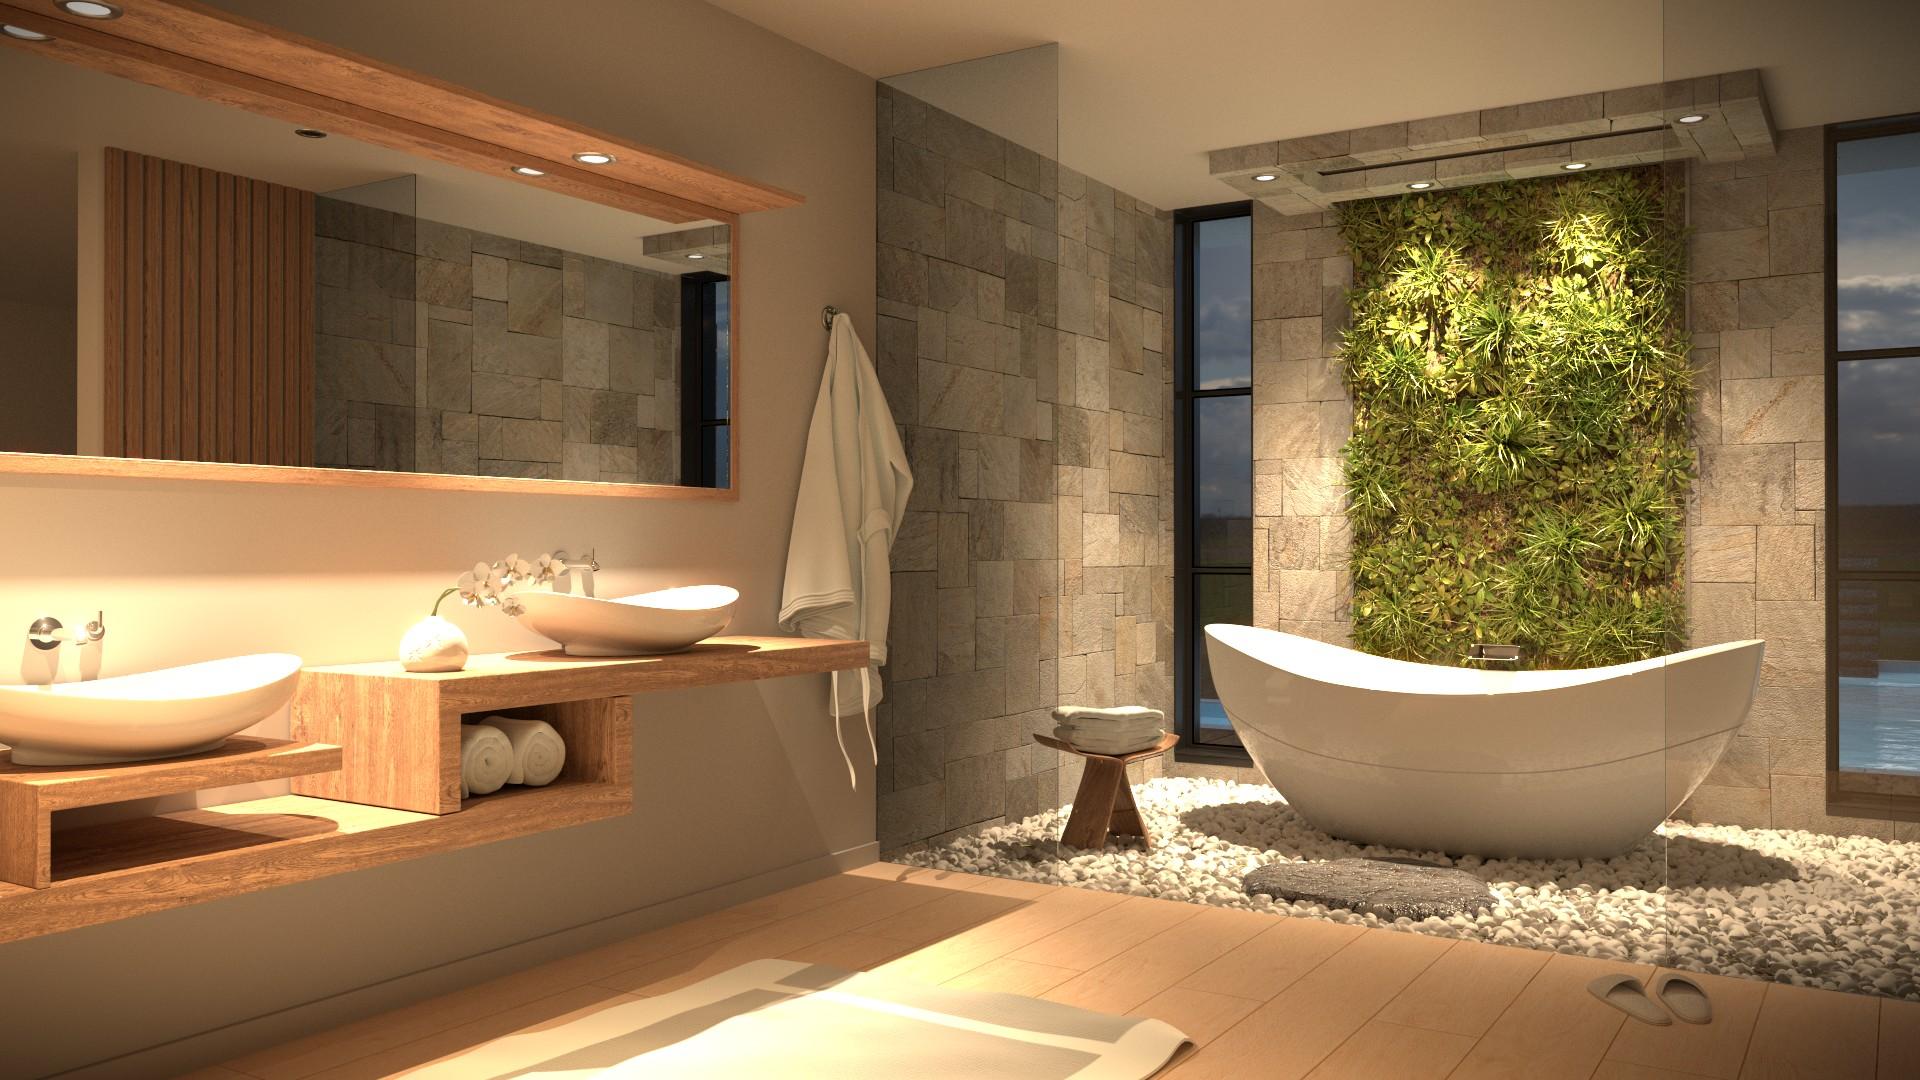 Modern Zen Bathroom Finished Projects Blender Artists Community